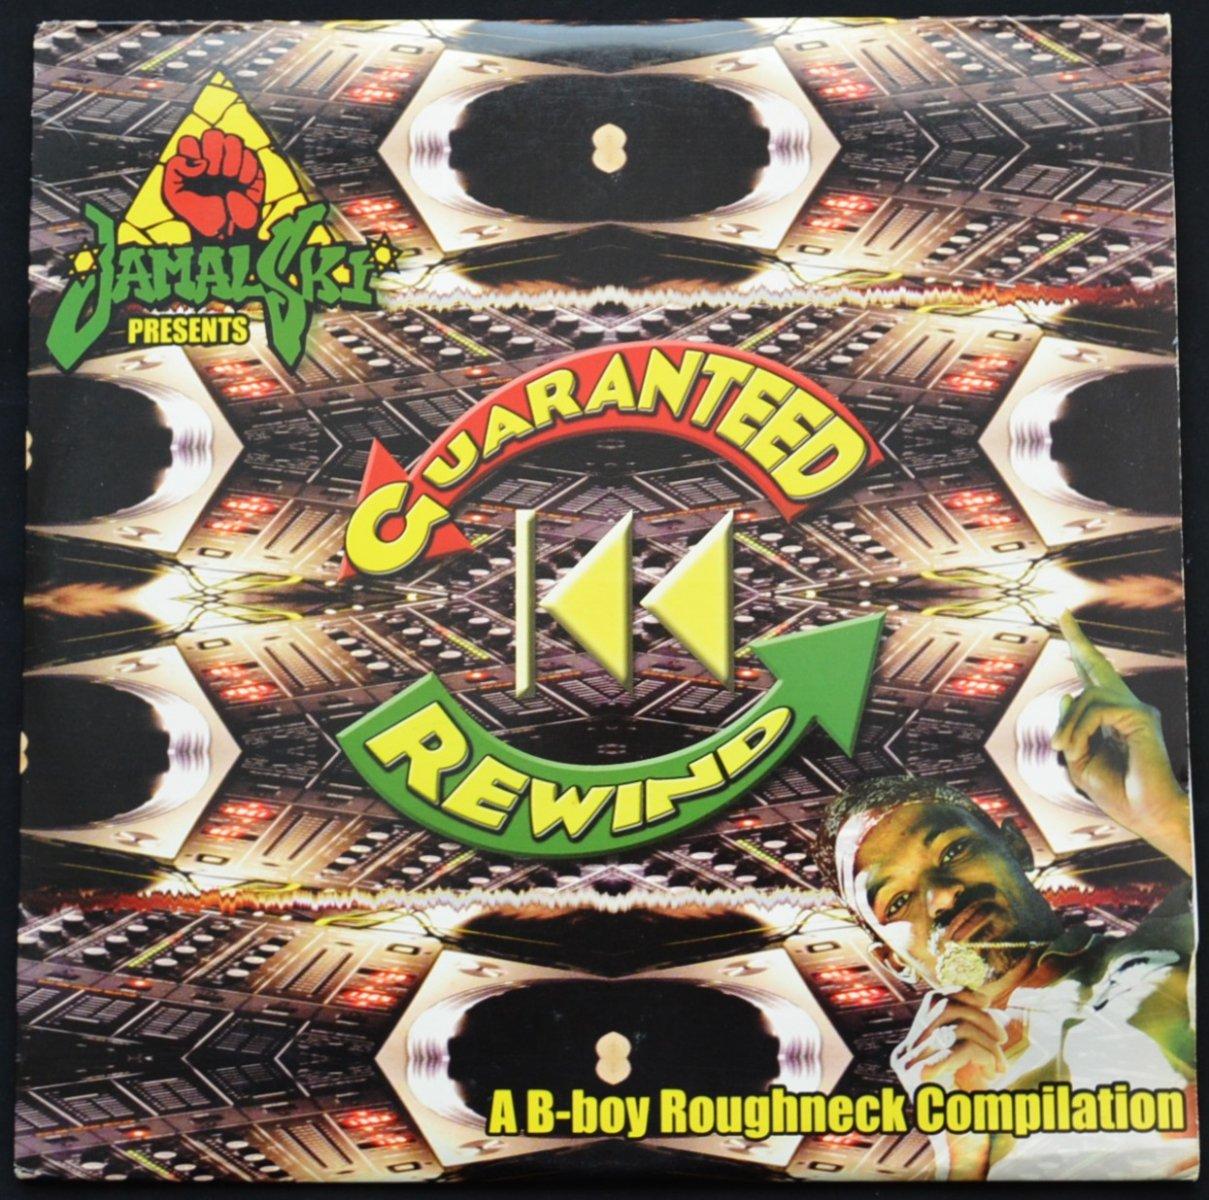 JAMALSKI / GUARANTEED REWIND - A B-BOY ROUGHNECK COMPILATION (3LP)